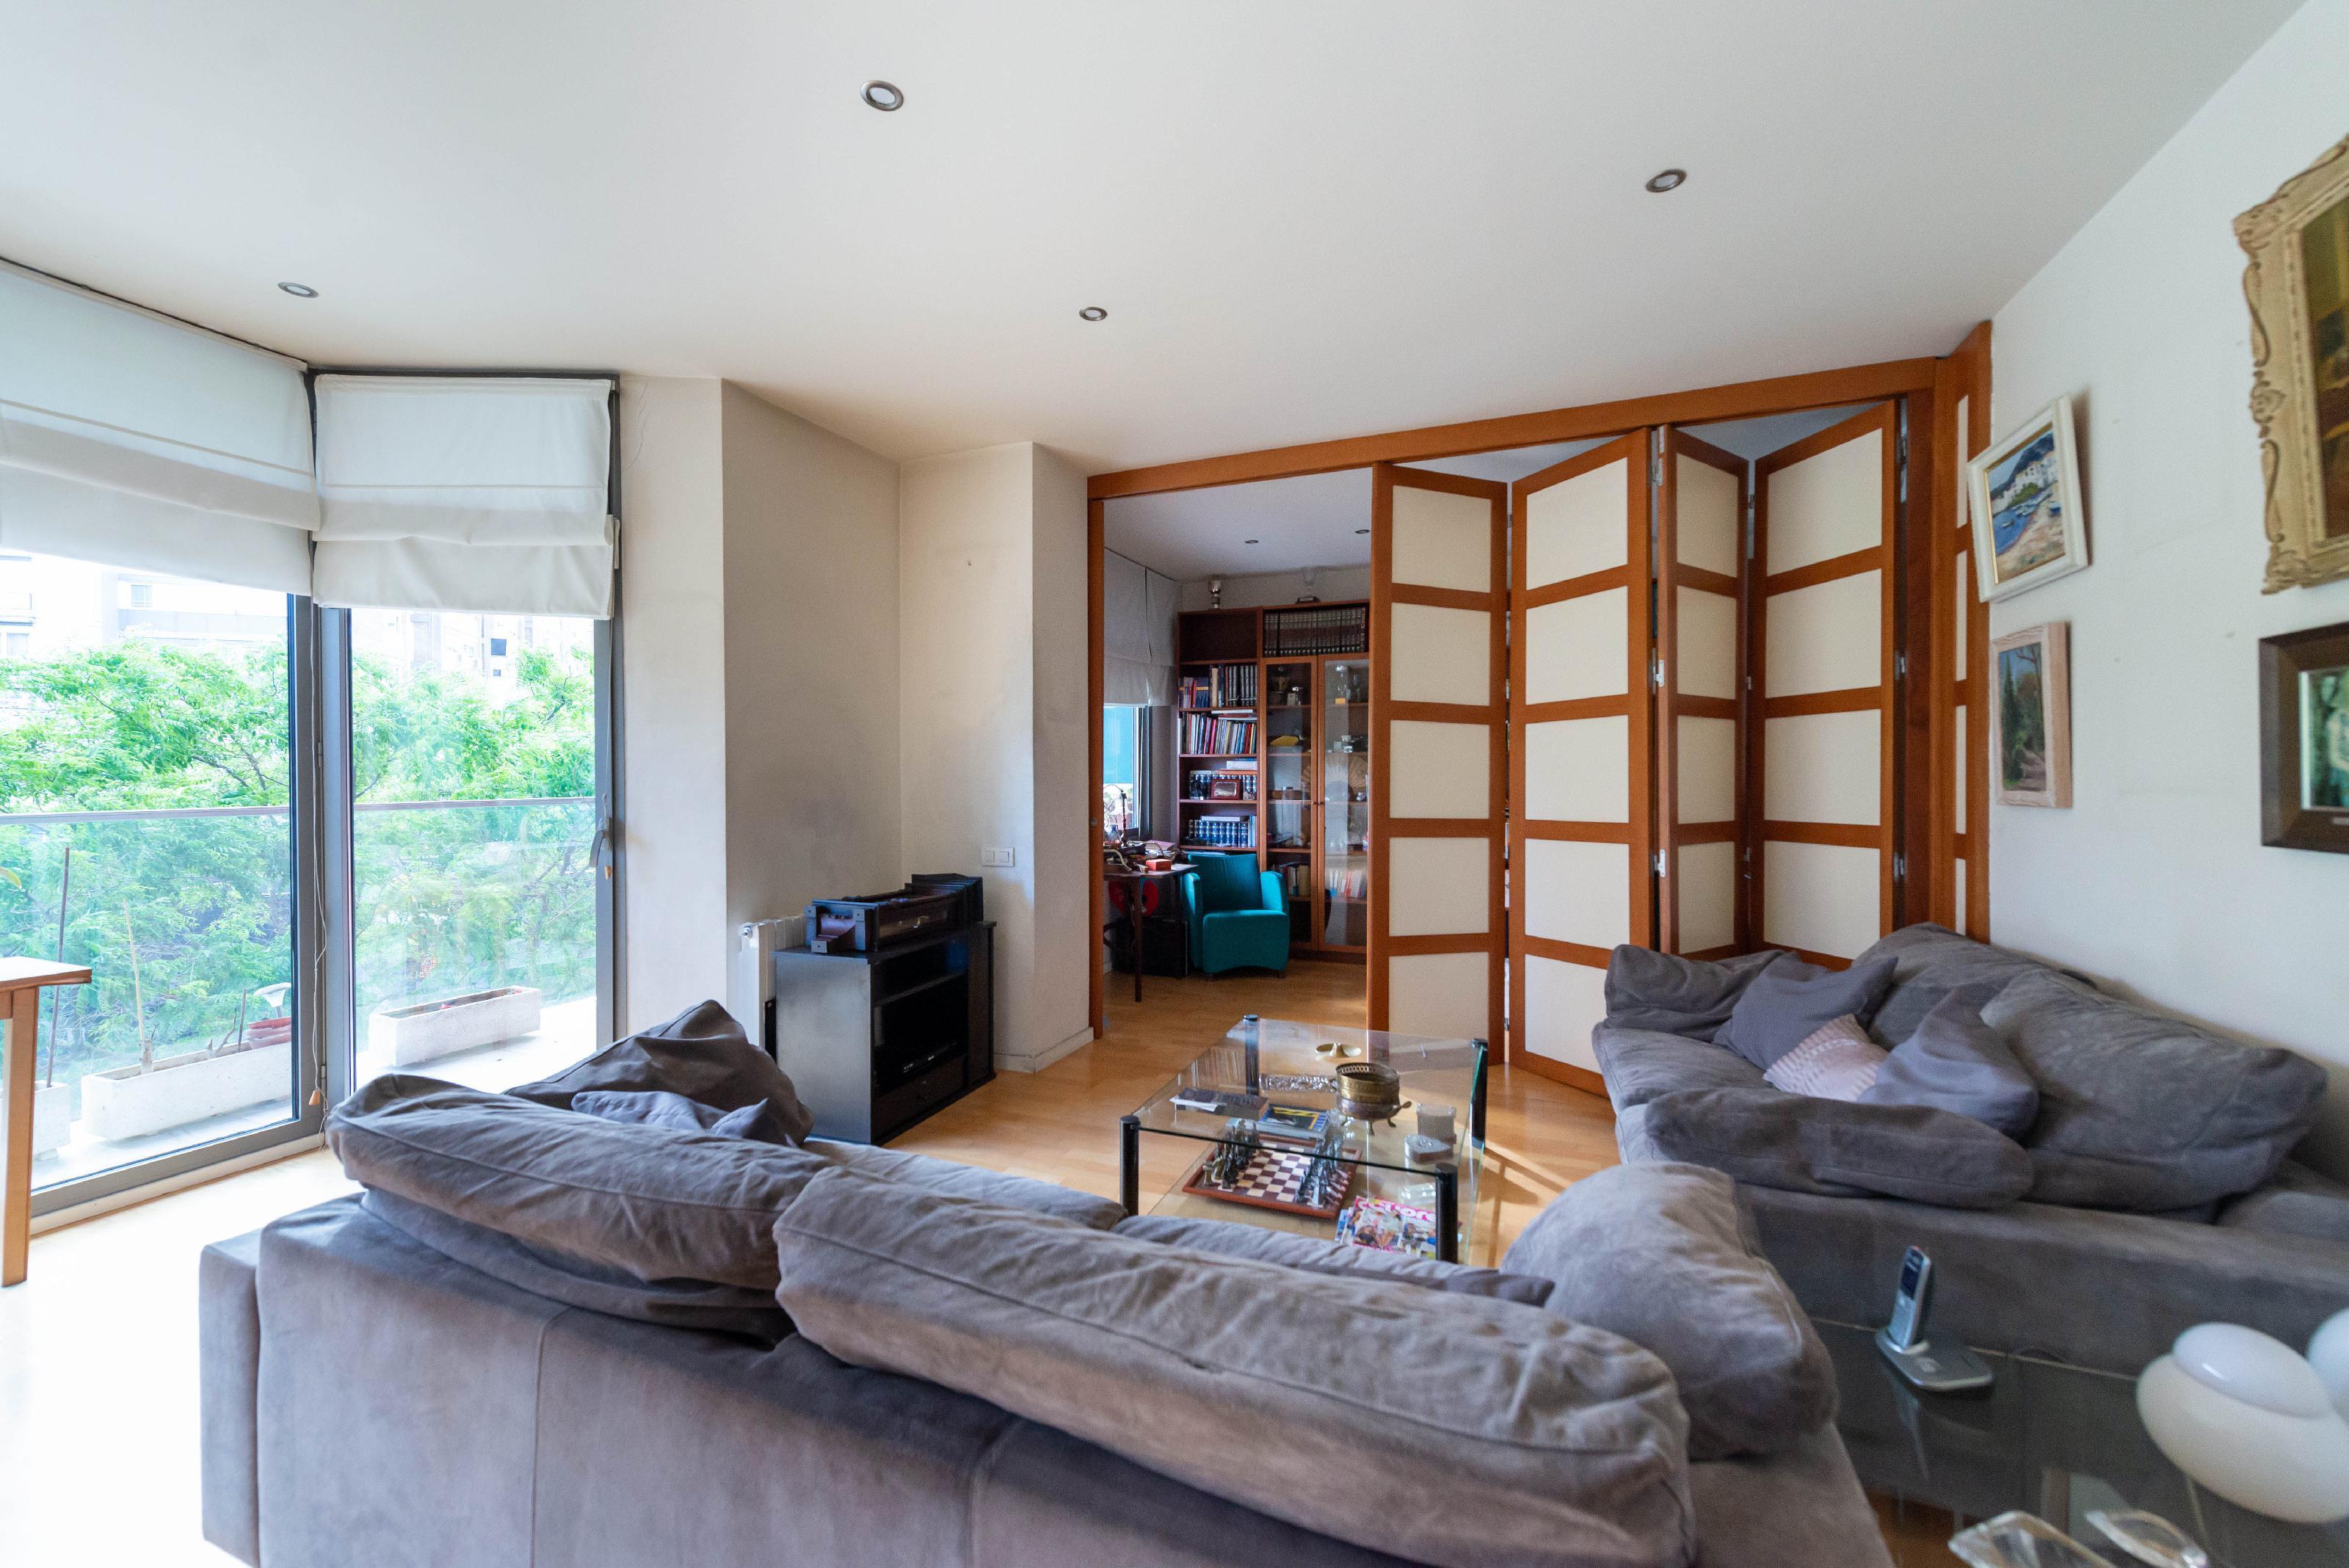 246281 Flat for sale in Sarrià-Sant Gervasi, Tres Torres 8